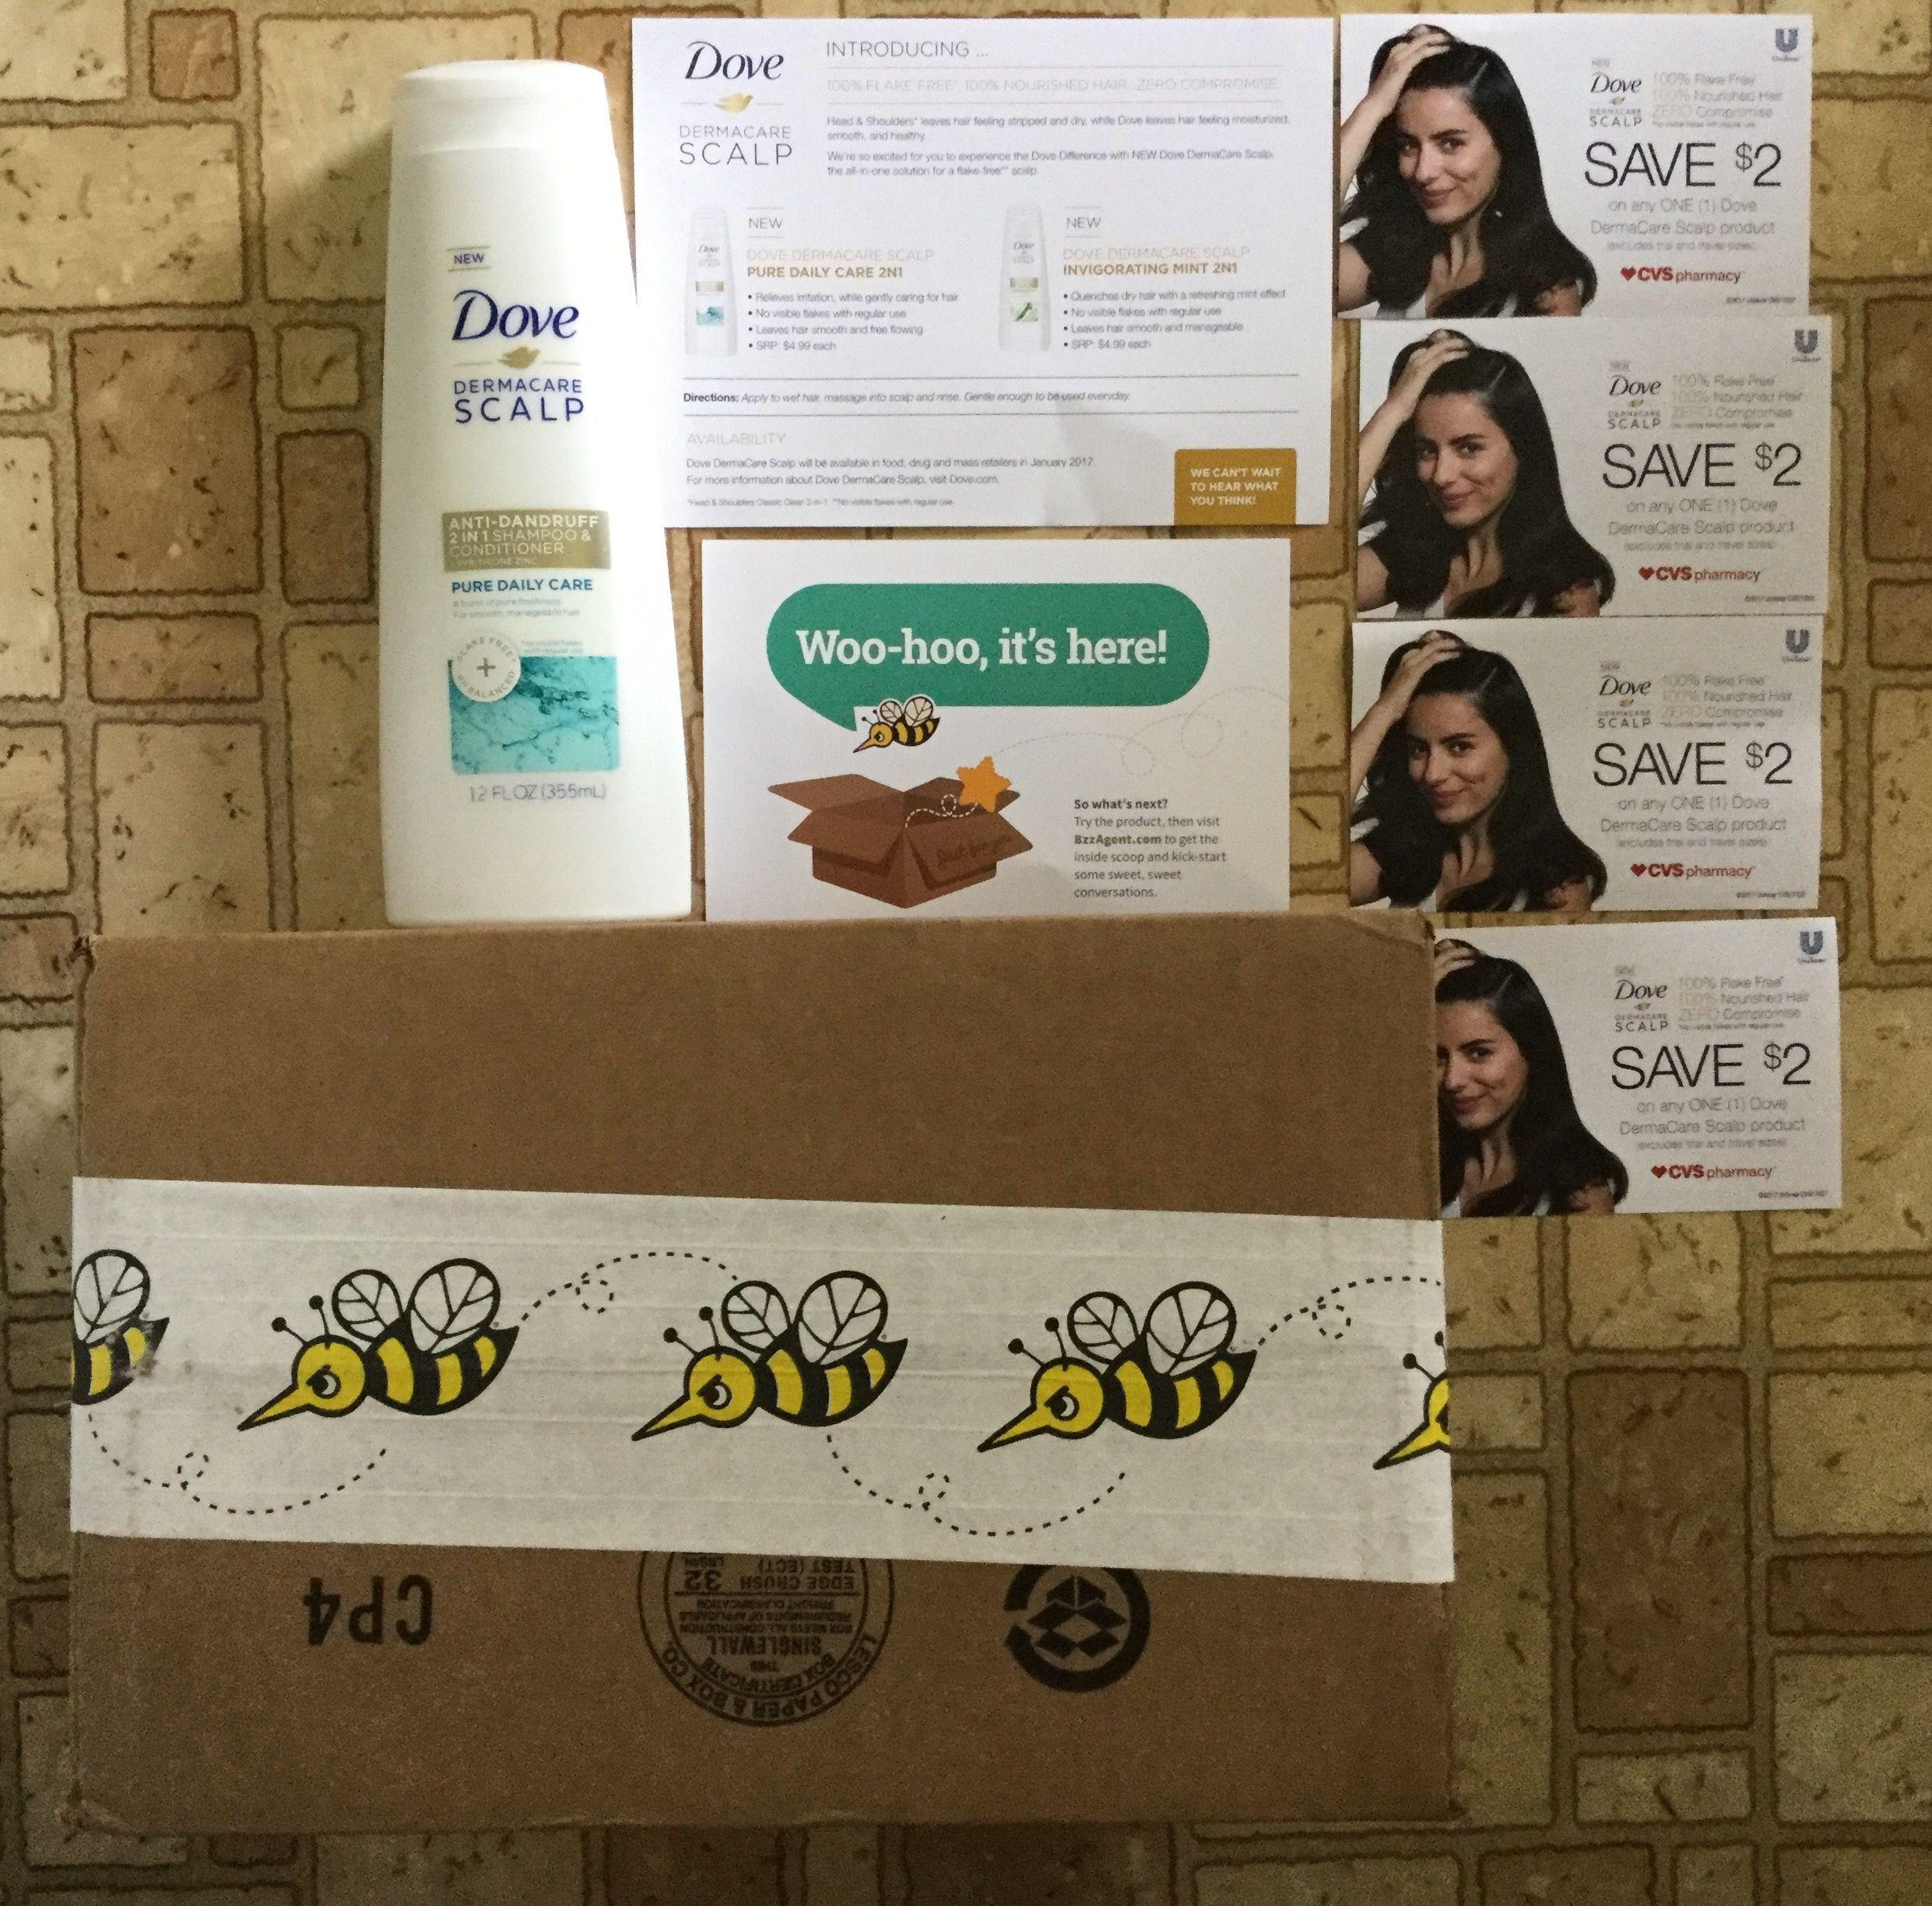 Free Dove DERMACARE Scalp Anti-Dandruff 2-1 shampoo & conditioner #freestuff #freebies #samples #free